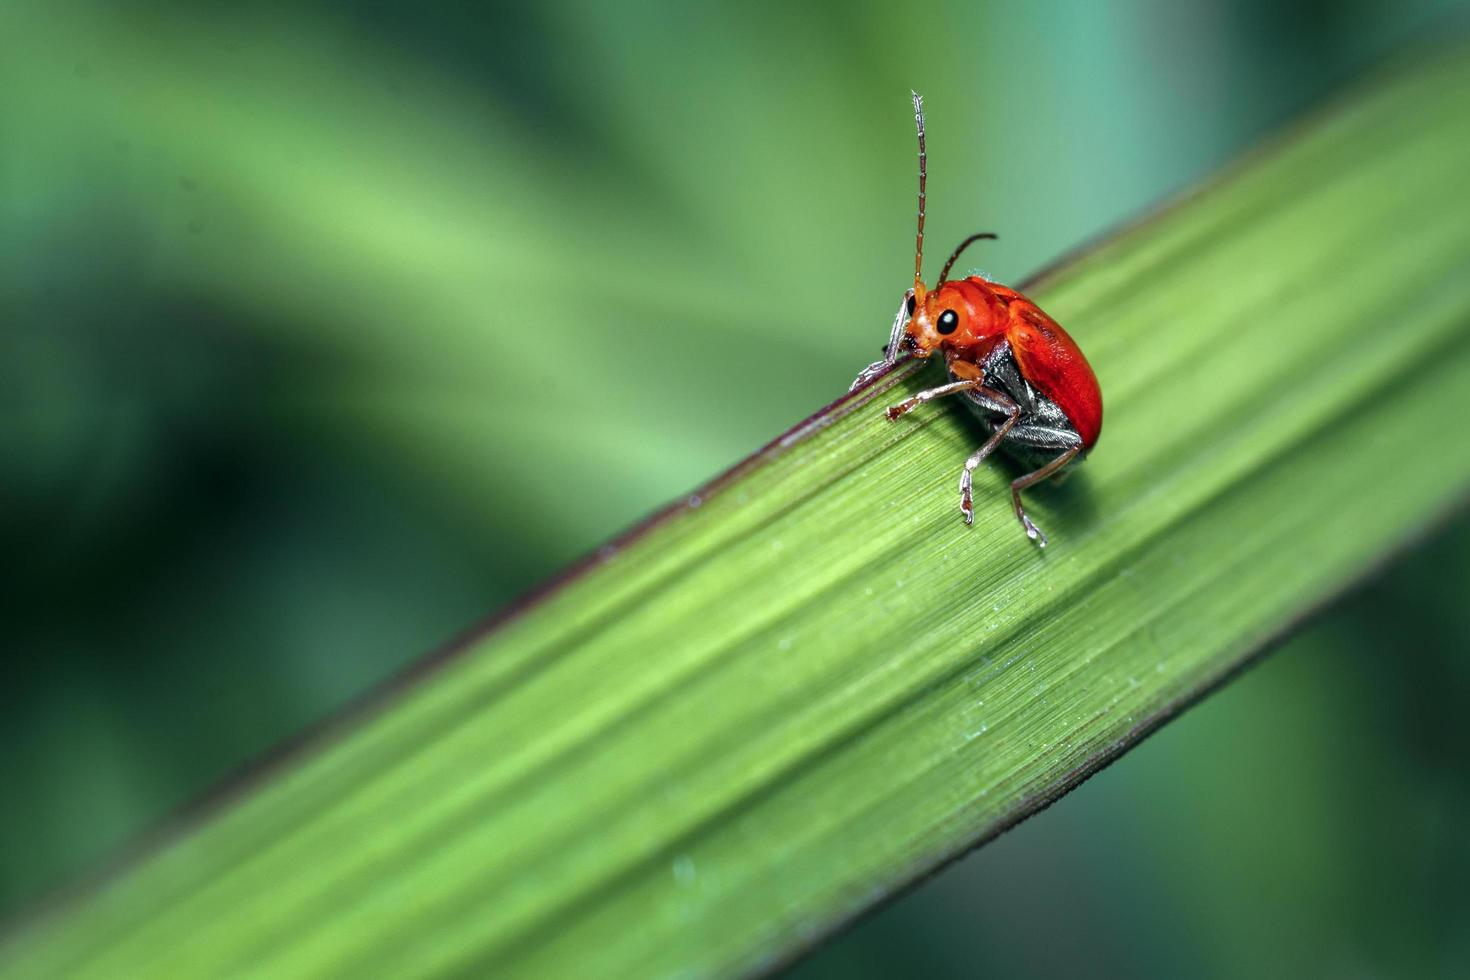 escarabajo naranja en la hoja foto